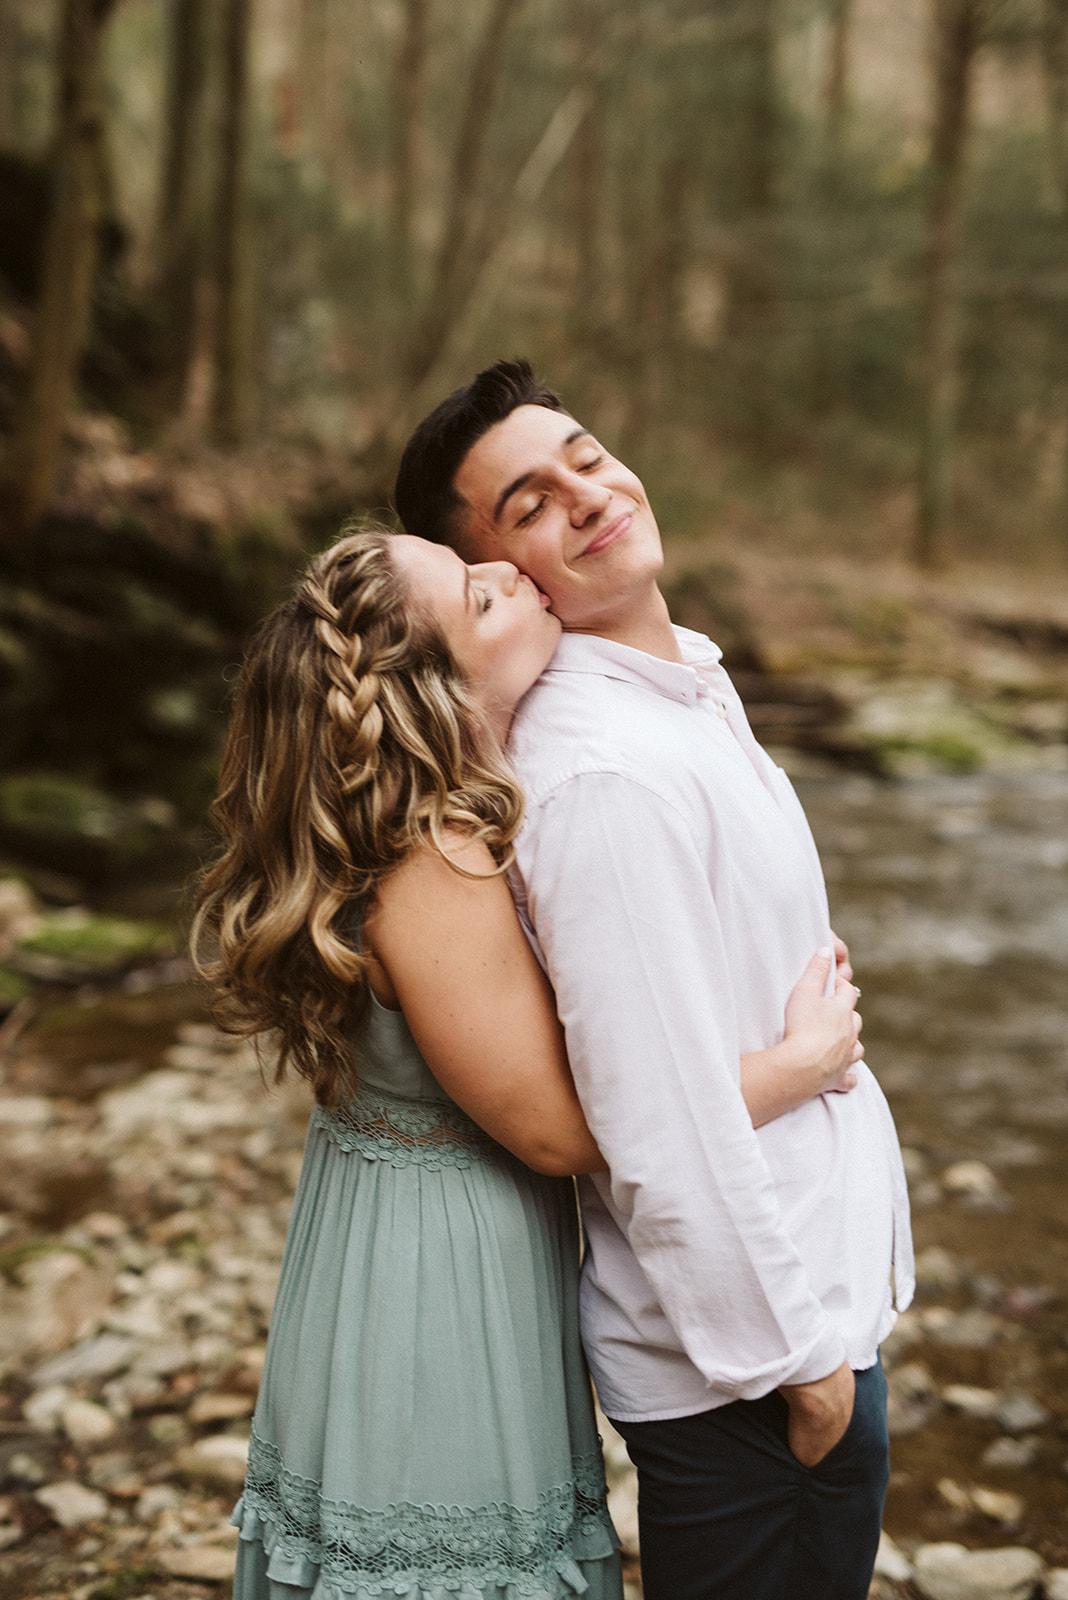 Wedding photographer located in Lancaster, Pennsylvania.